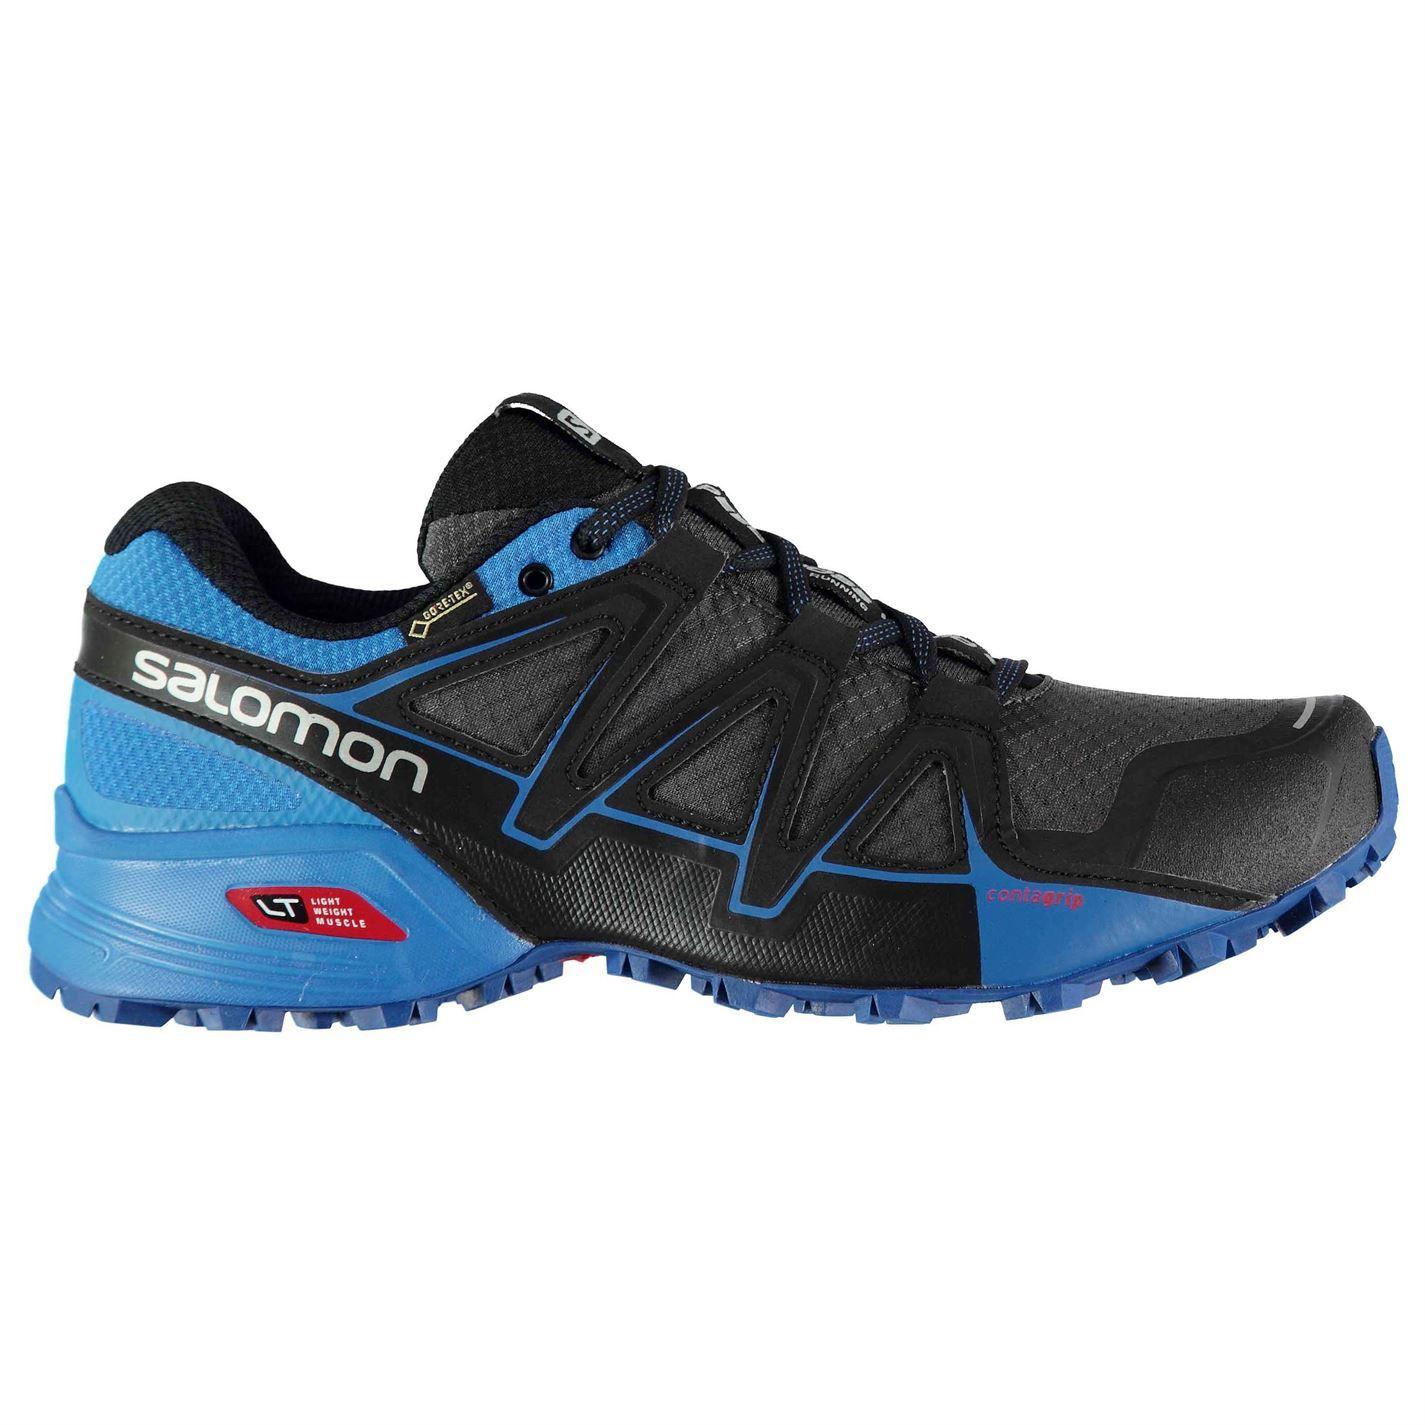 Salomon Speedcross V GTX Trail Running Schuhes  Herren Herren  Gents Ventilated Water 7d5daf